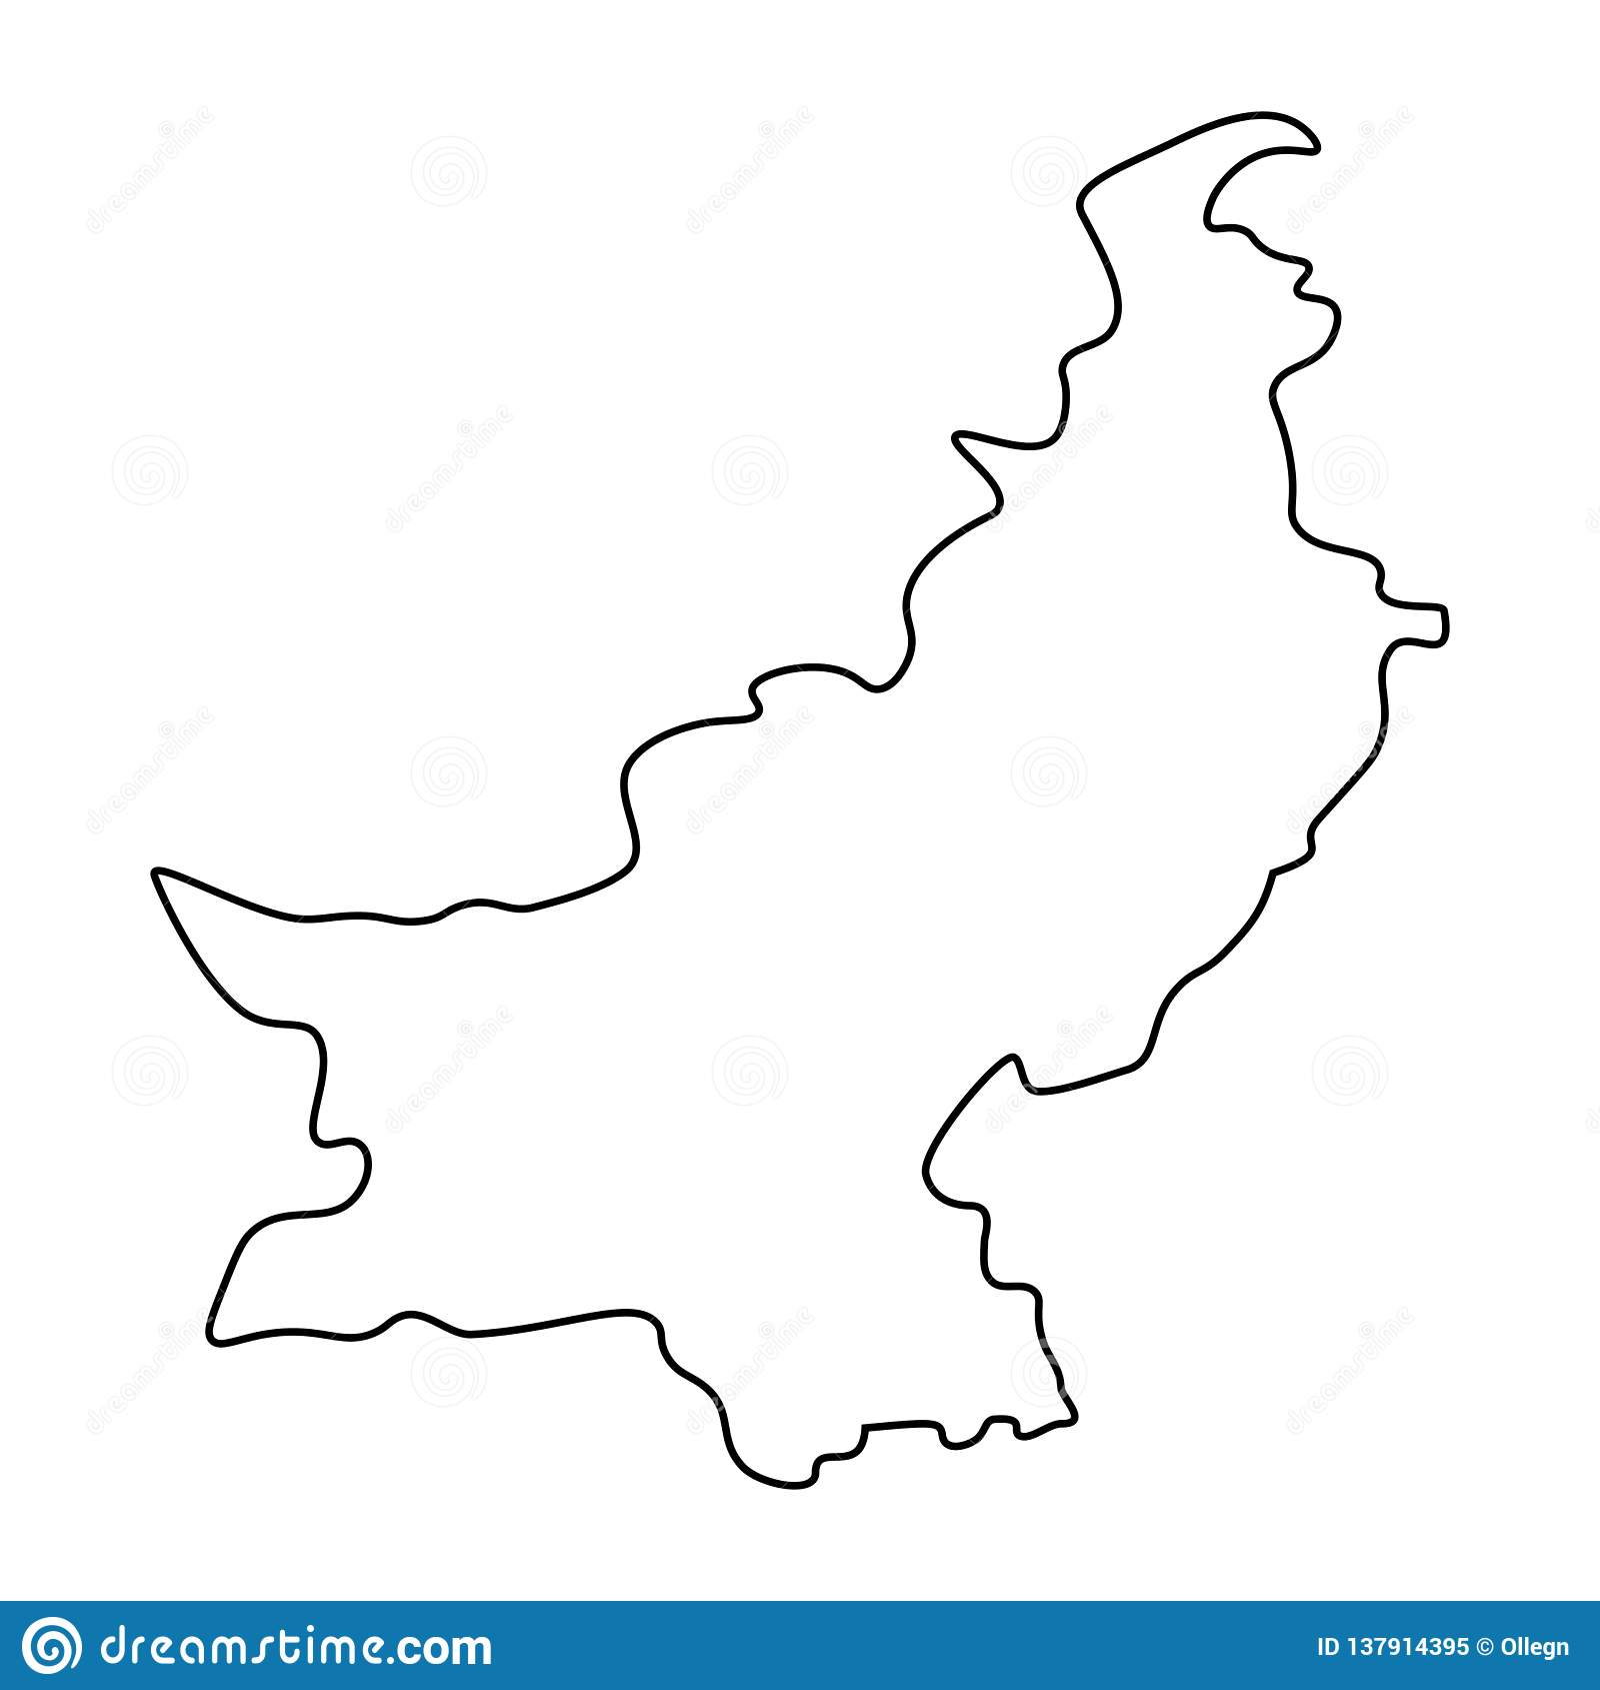 Map of Pakistan - outline stock illustration  Illustration